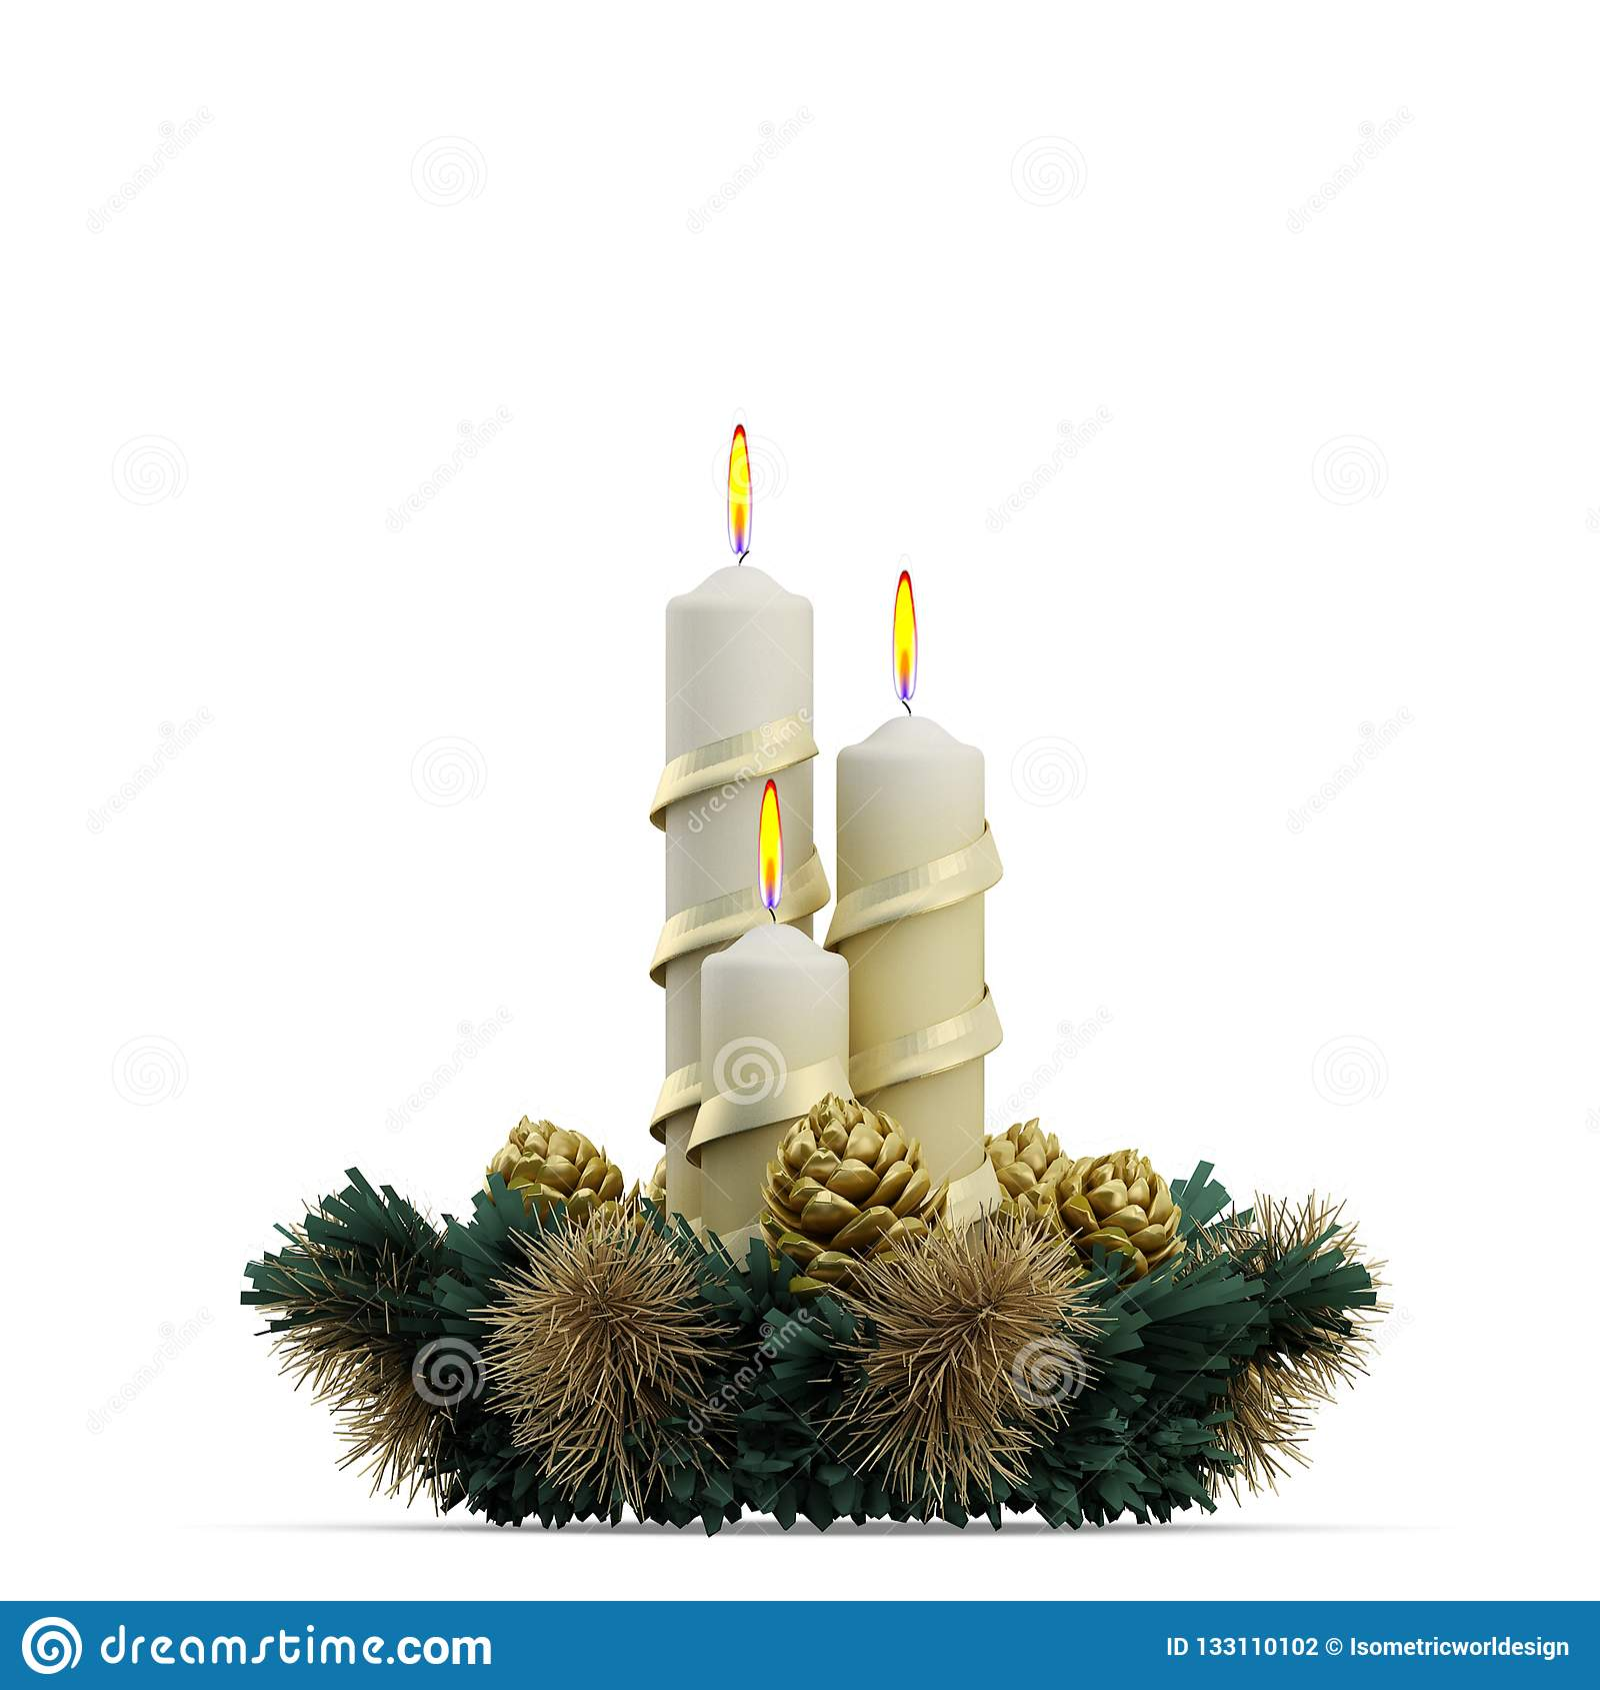 Rappresentazione isometrica di festa 3D di Natale